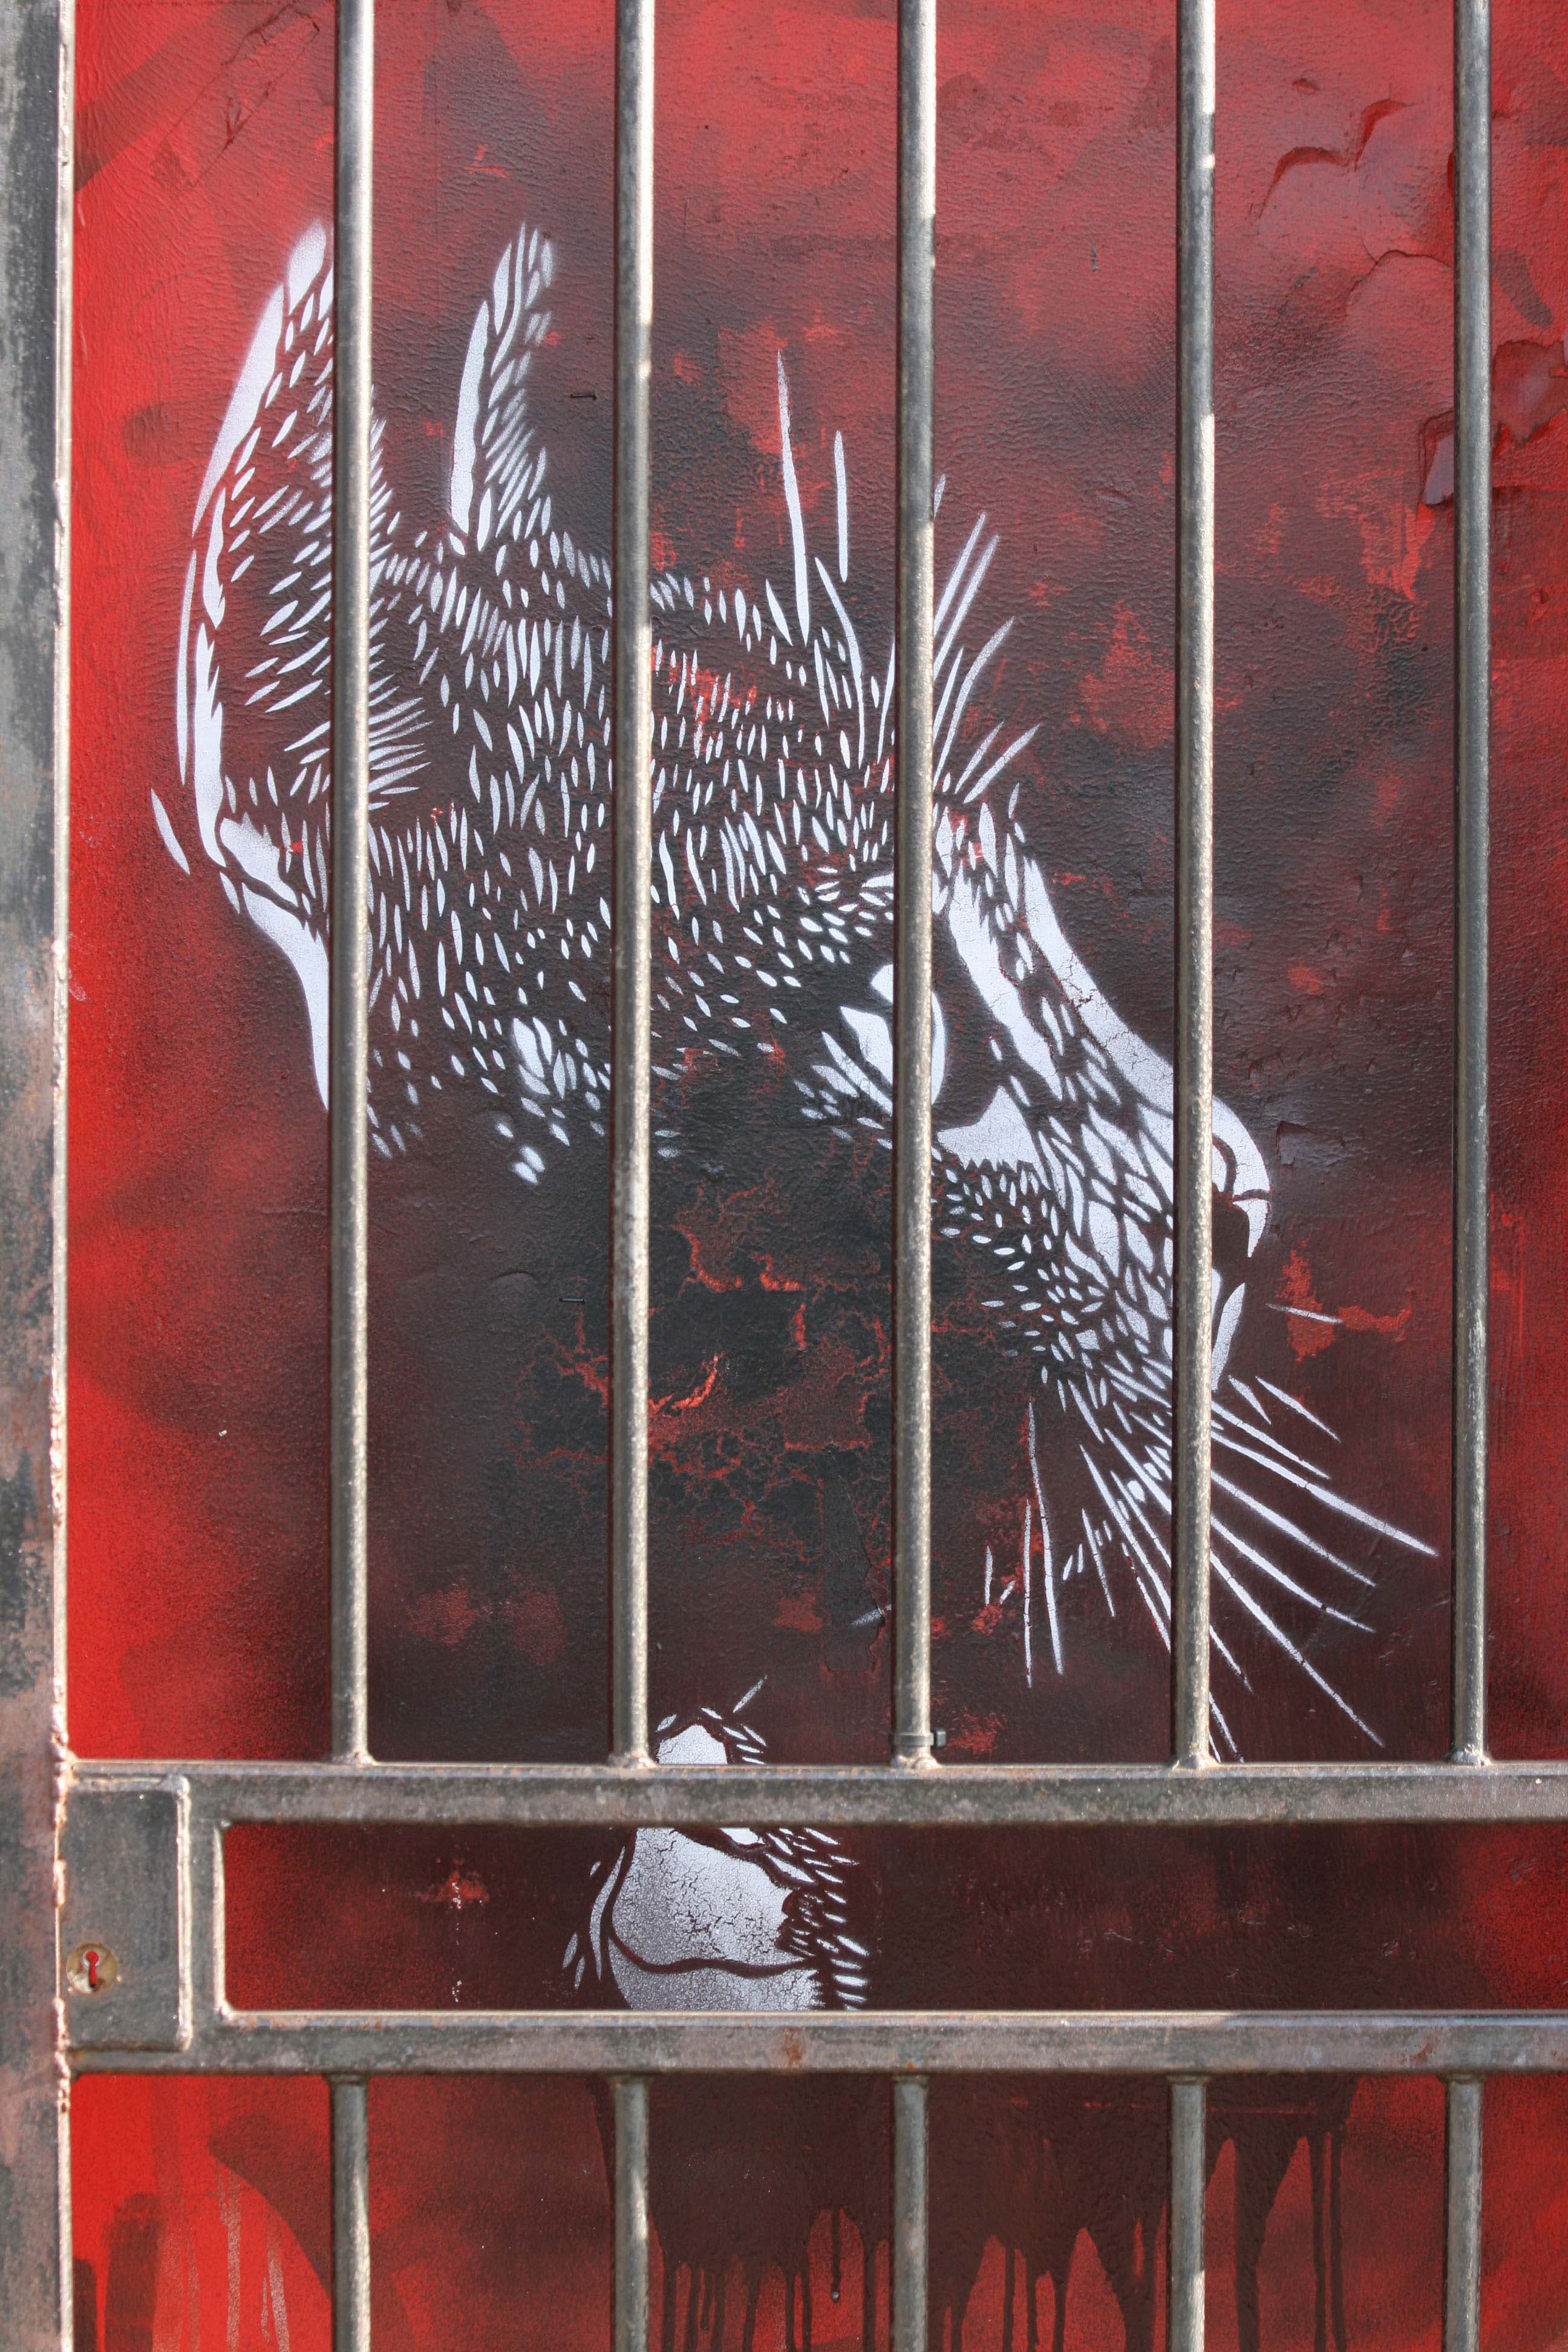 Cat Behind Bars - Street Art by C215 in London